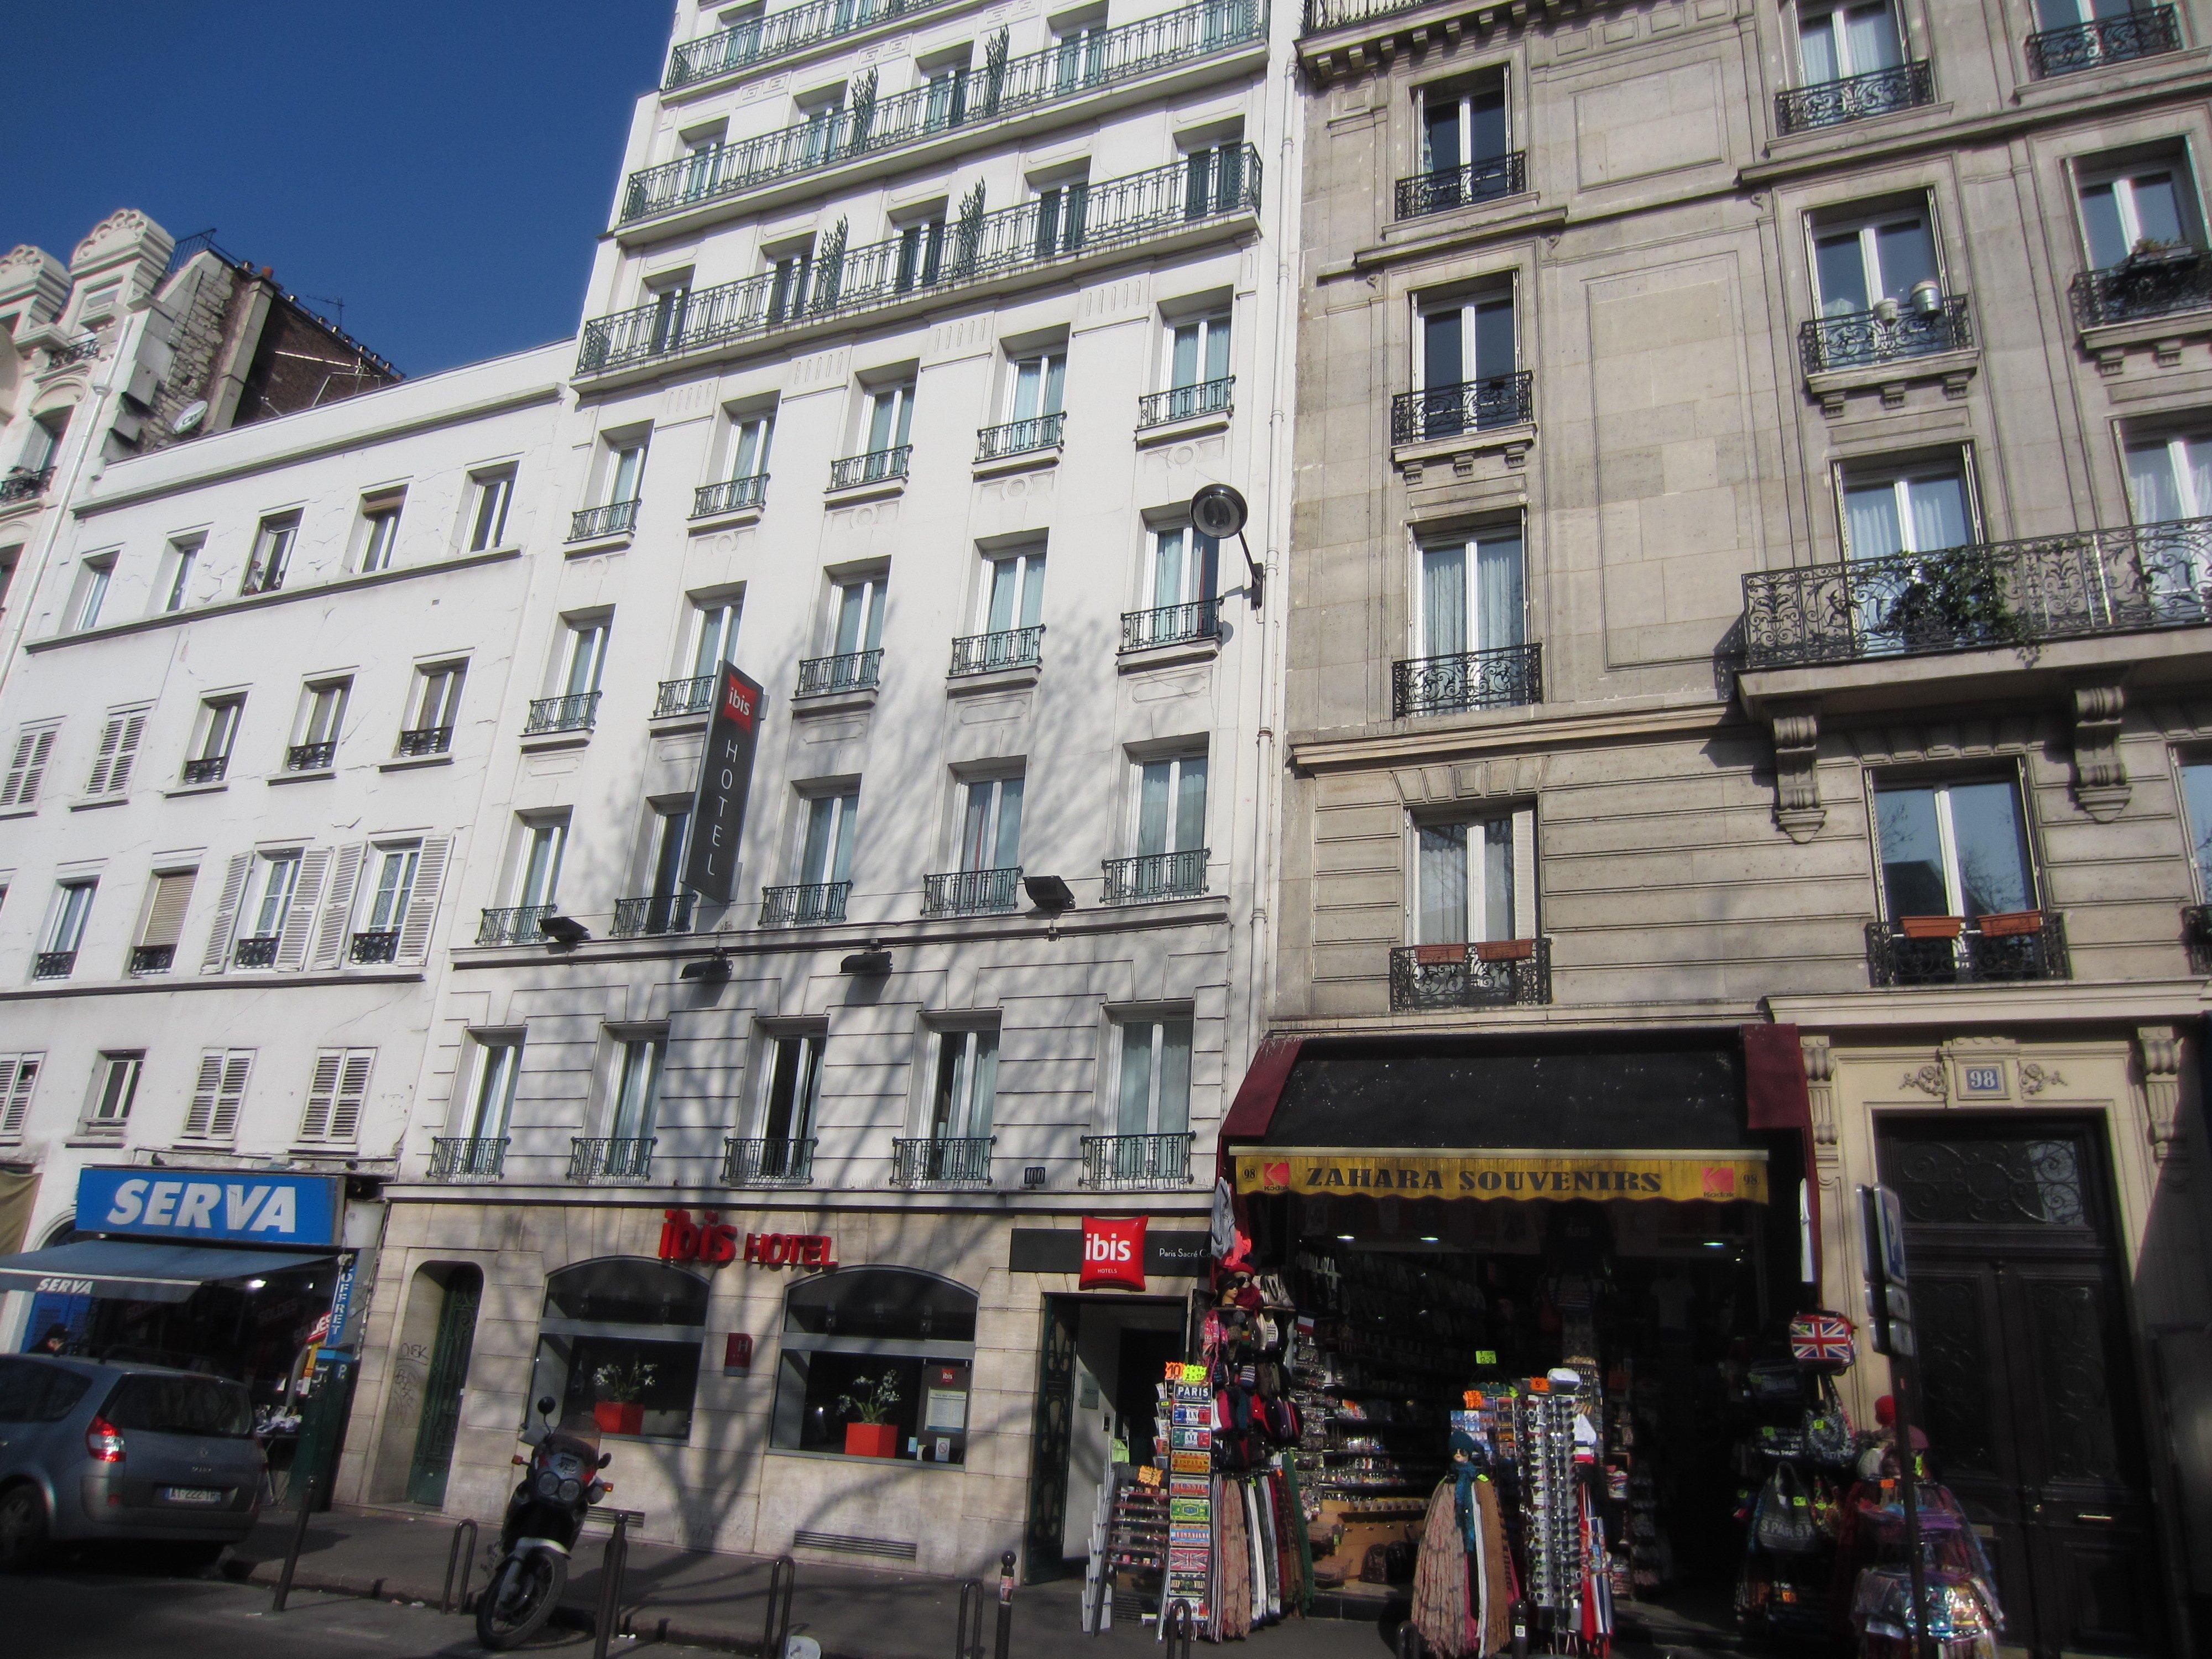 Hotel ibis paris sacr coeur 18 me in paris holidaycheck for Frankreich hotel paris